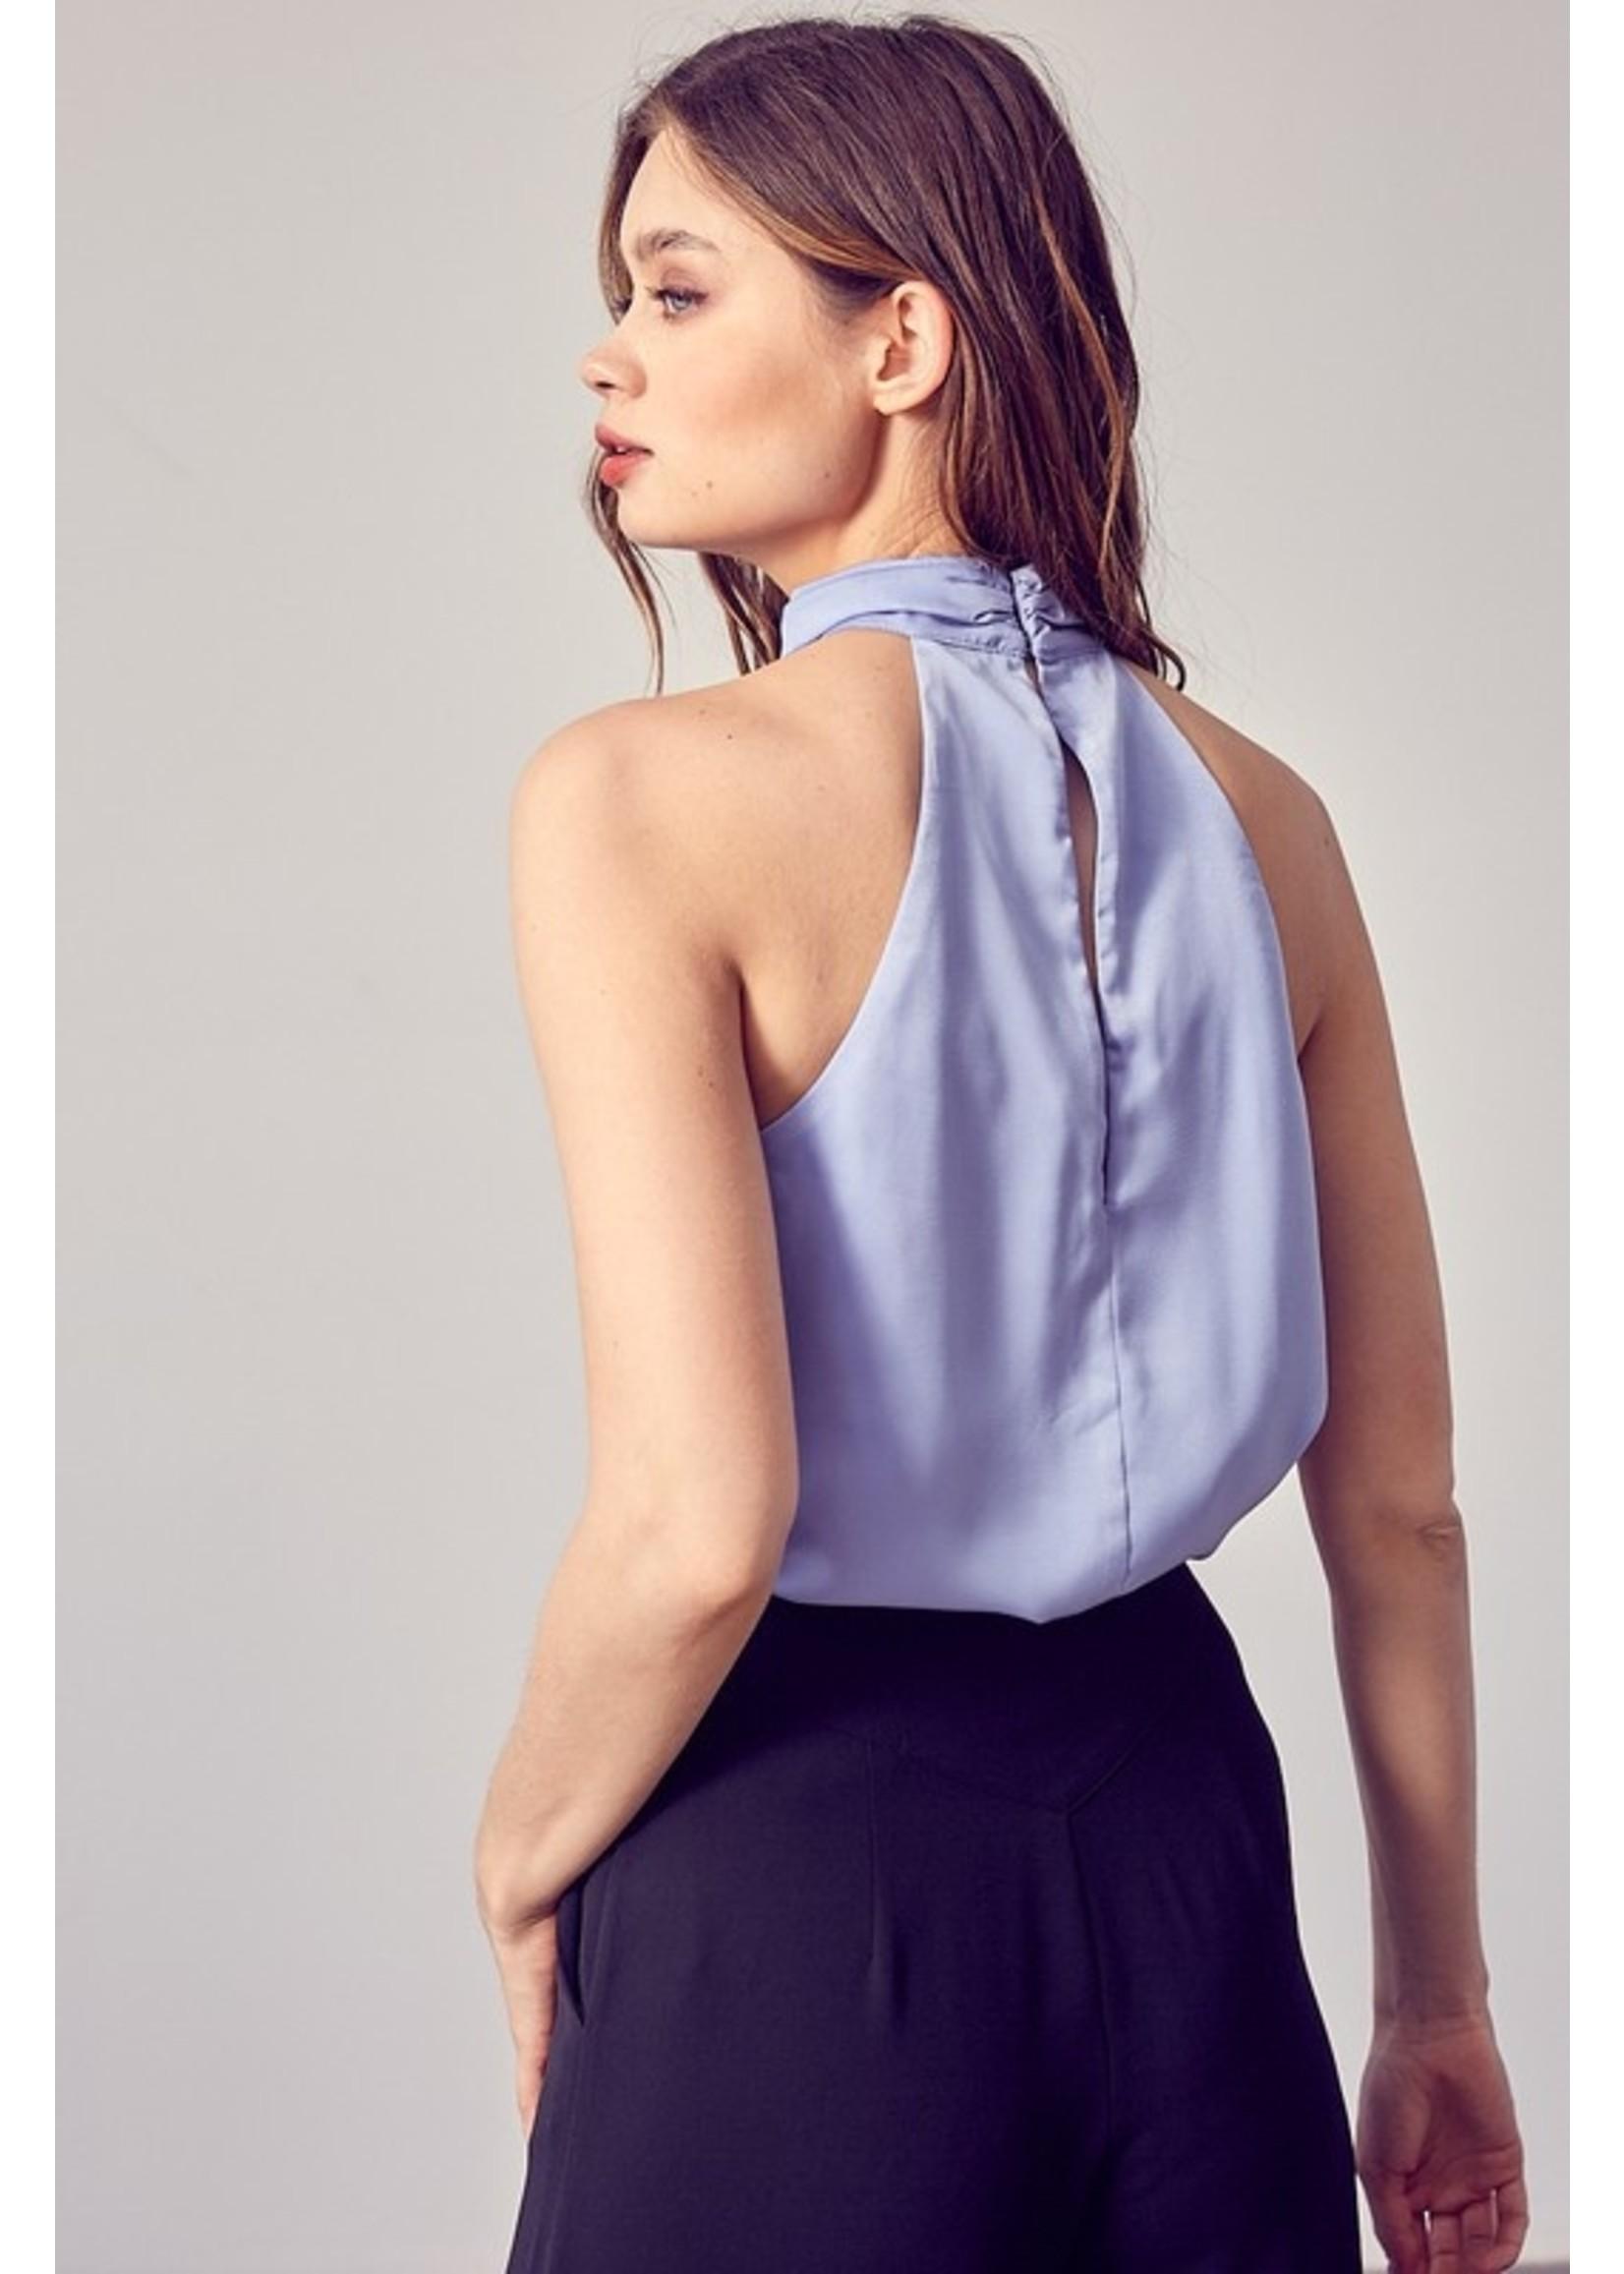 DO + BE Sleeveless Halter Neck Bodysuit - Y20682